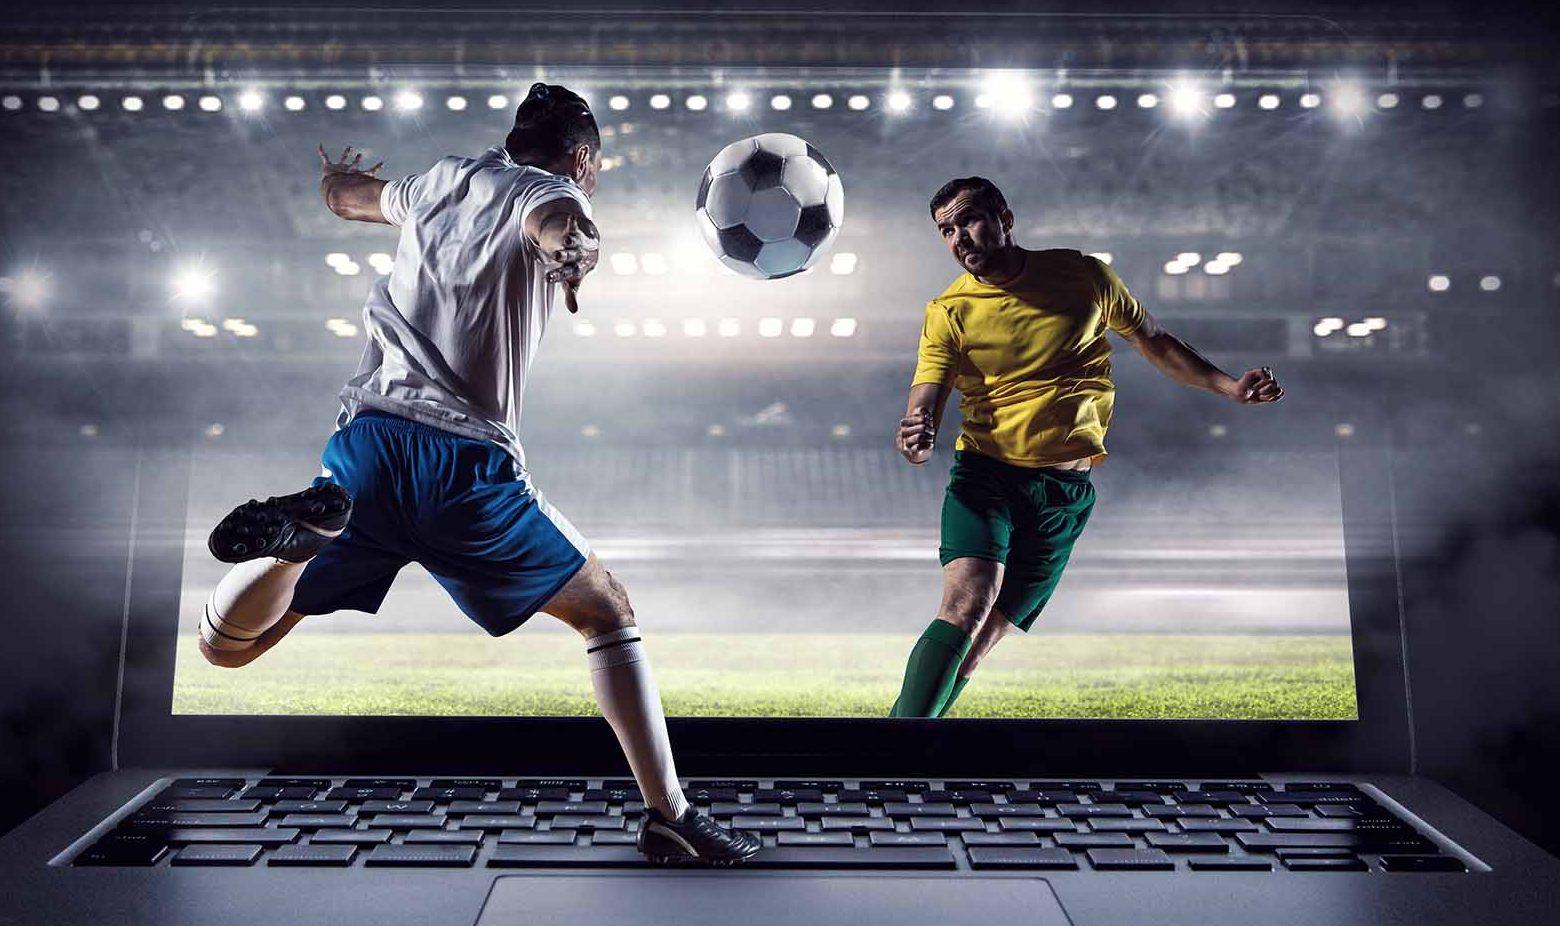 прогнозы и ставки на спорт